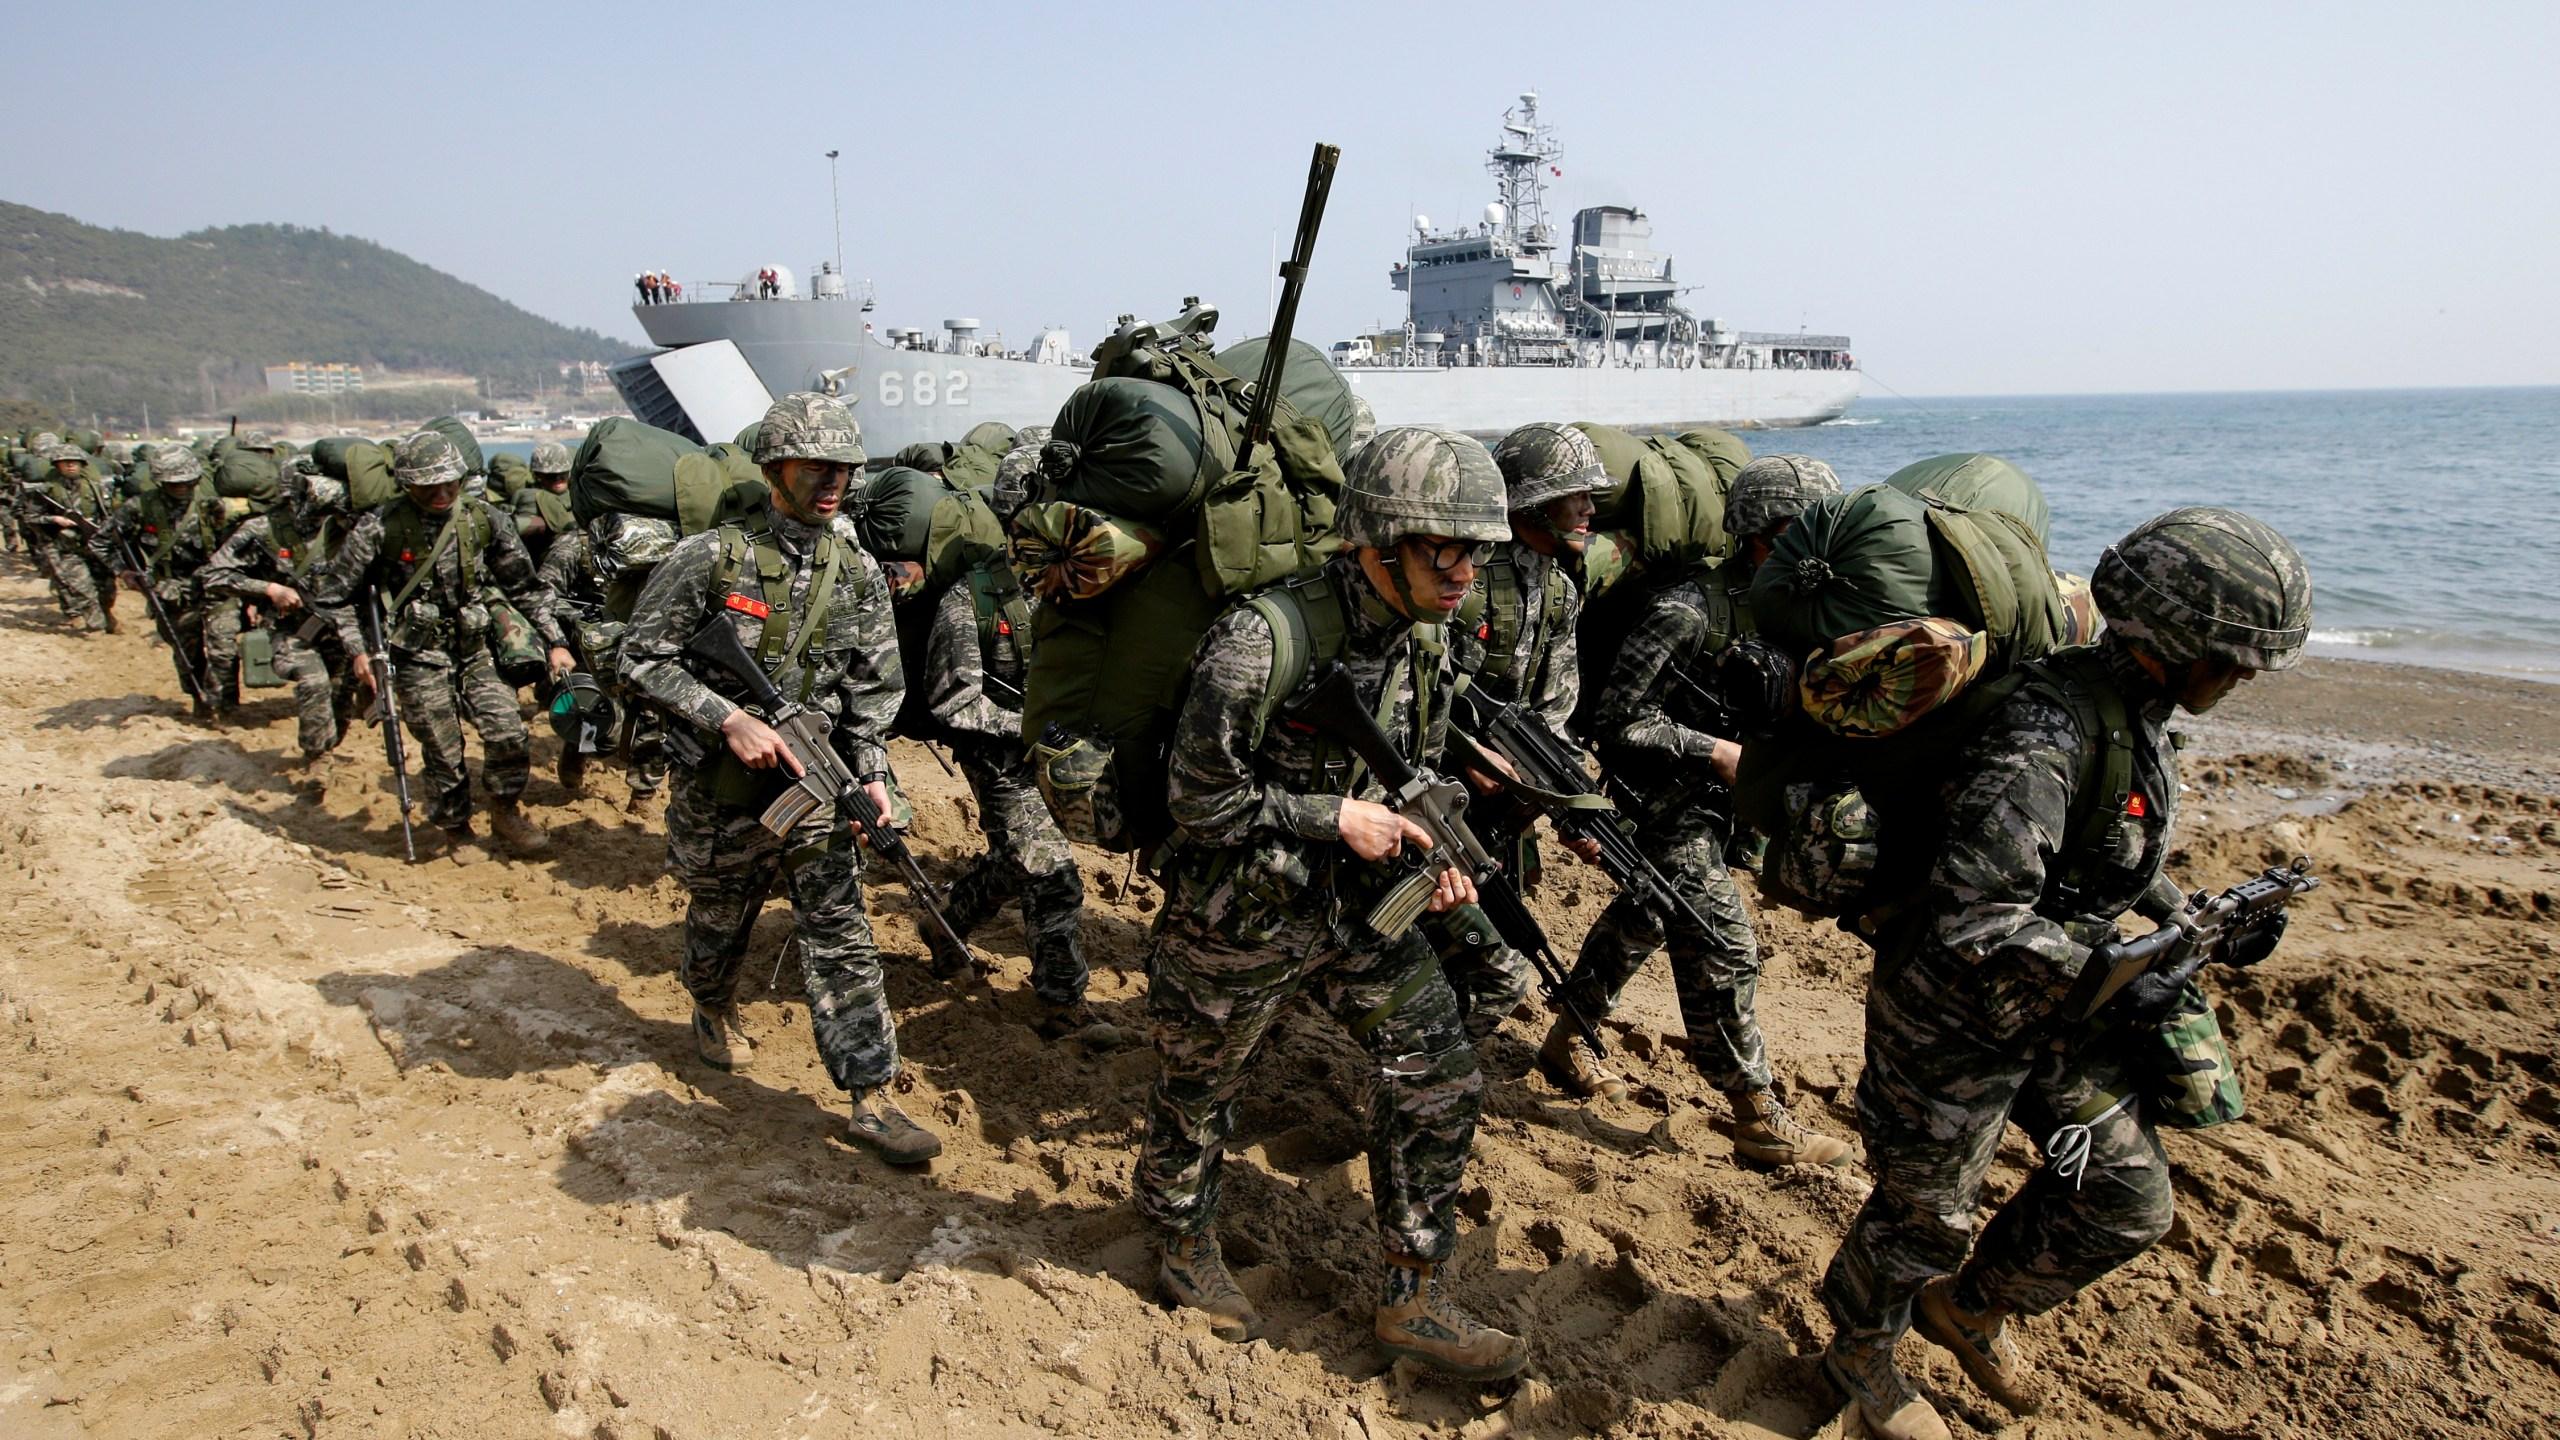 South_Korea_Koreas_US_Military_Drills_91681-159532.jpg79721174